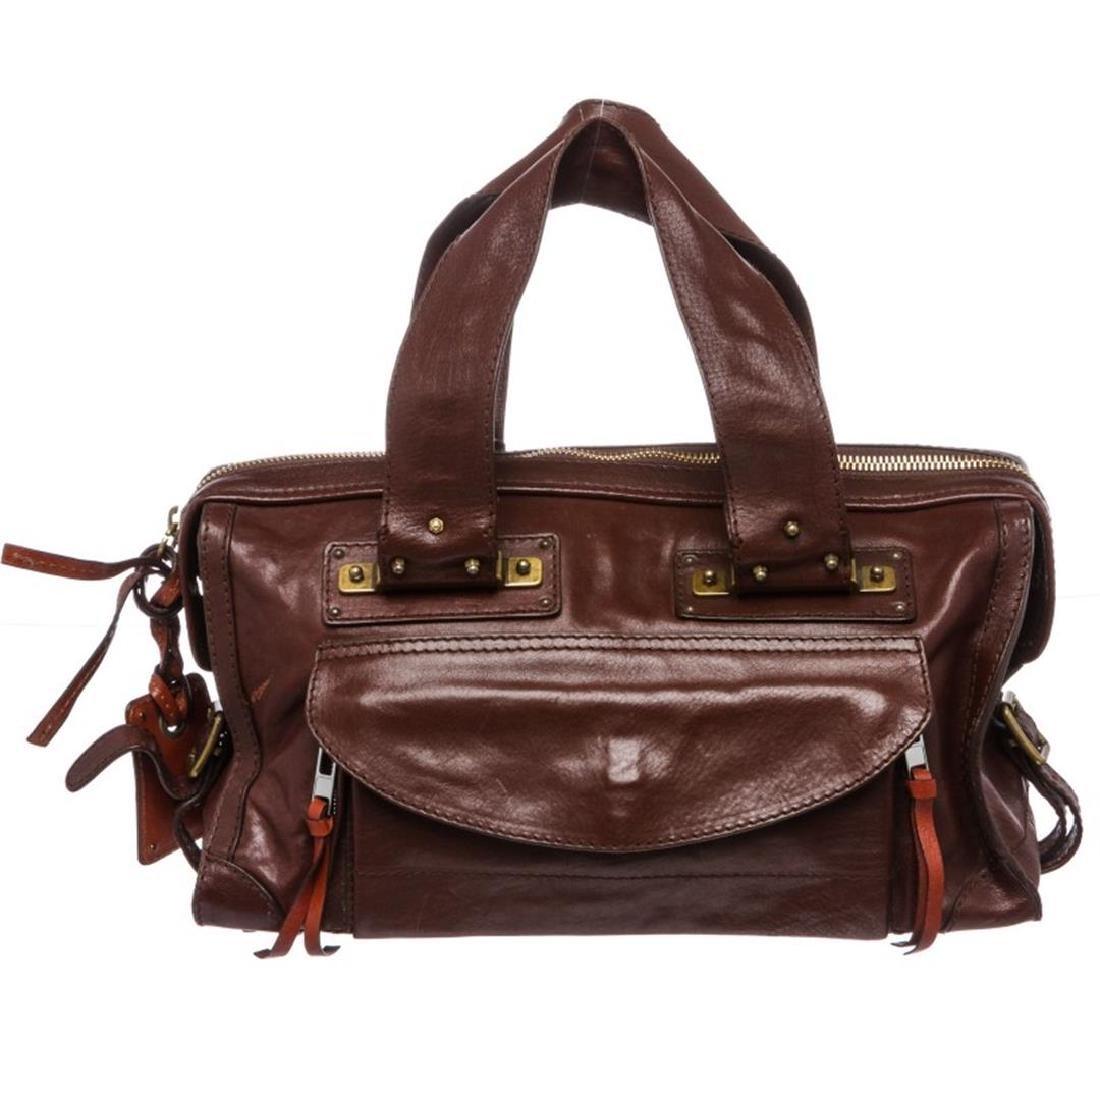 Chloe Burgundy Leather Tracy Satchel Bag